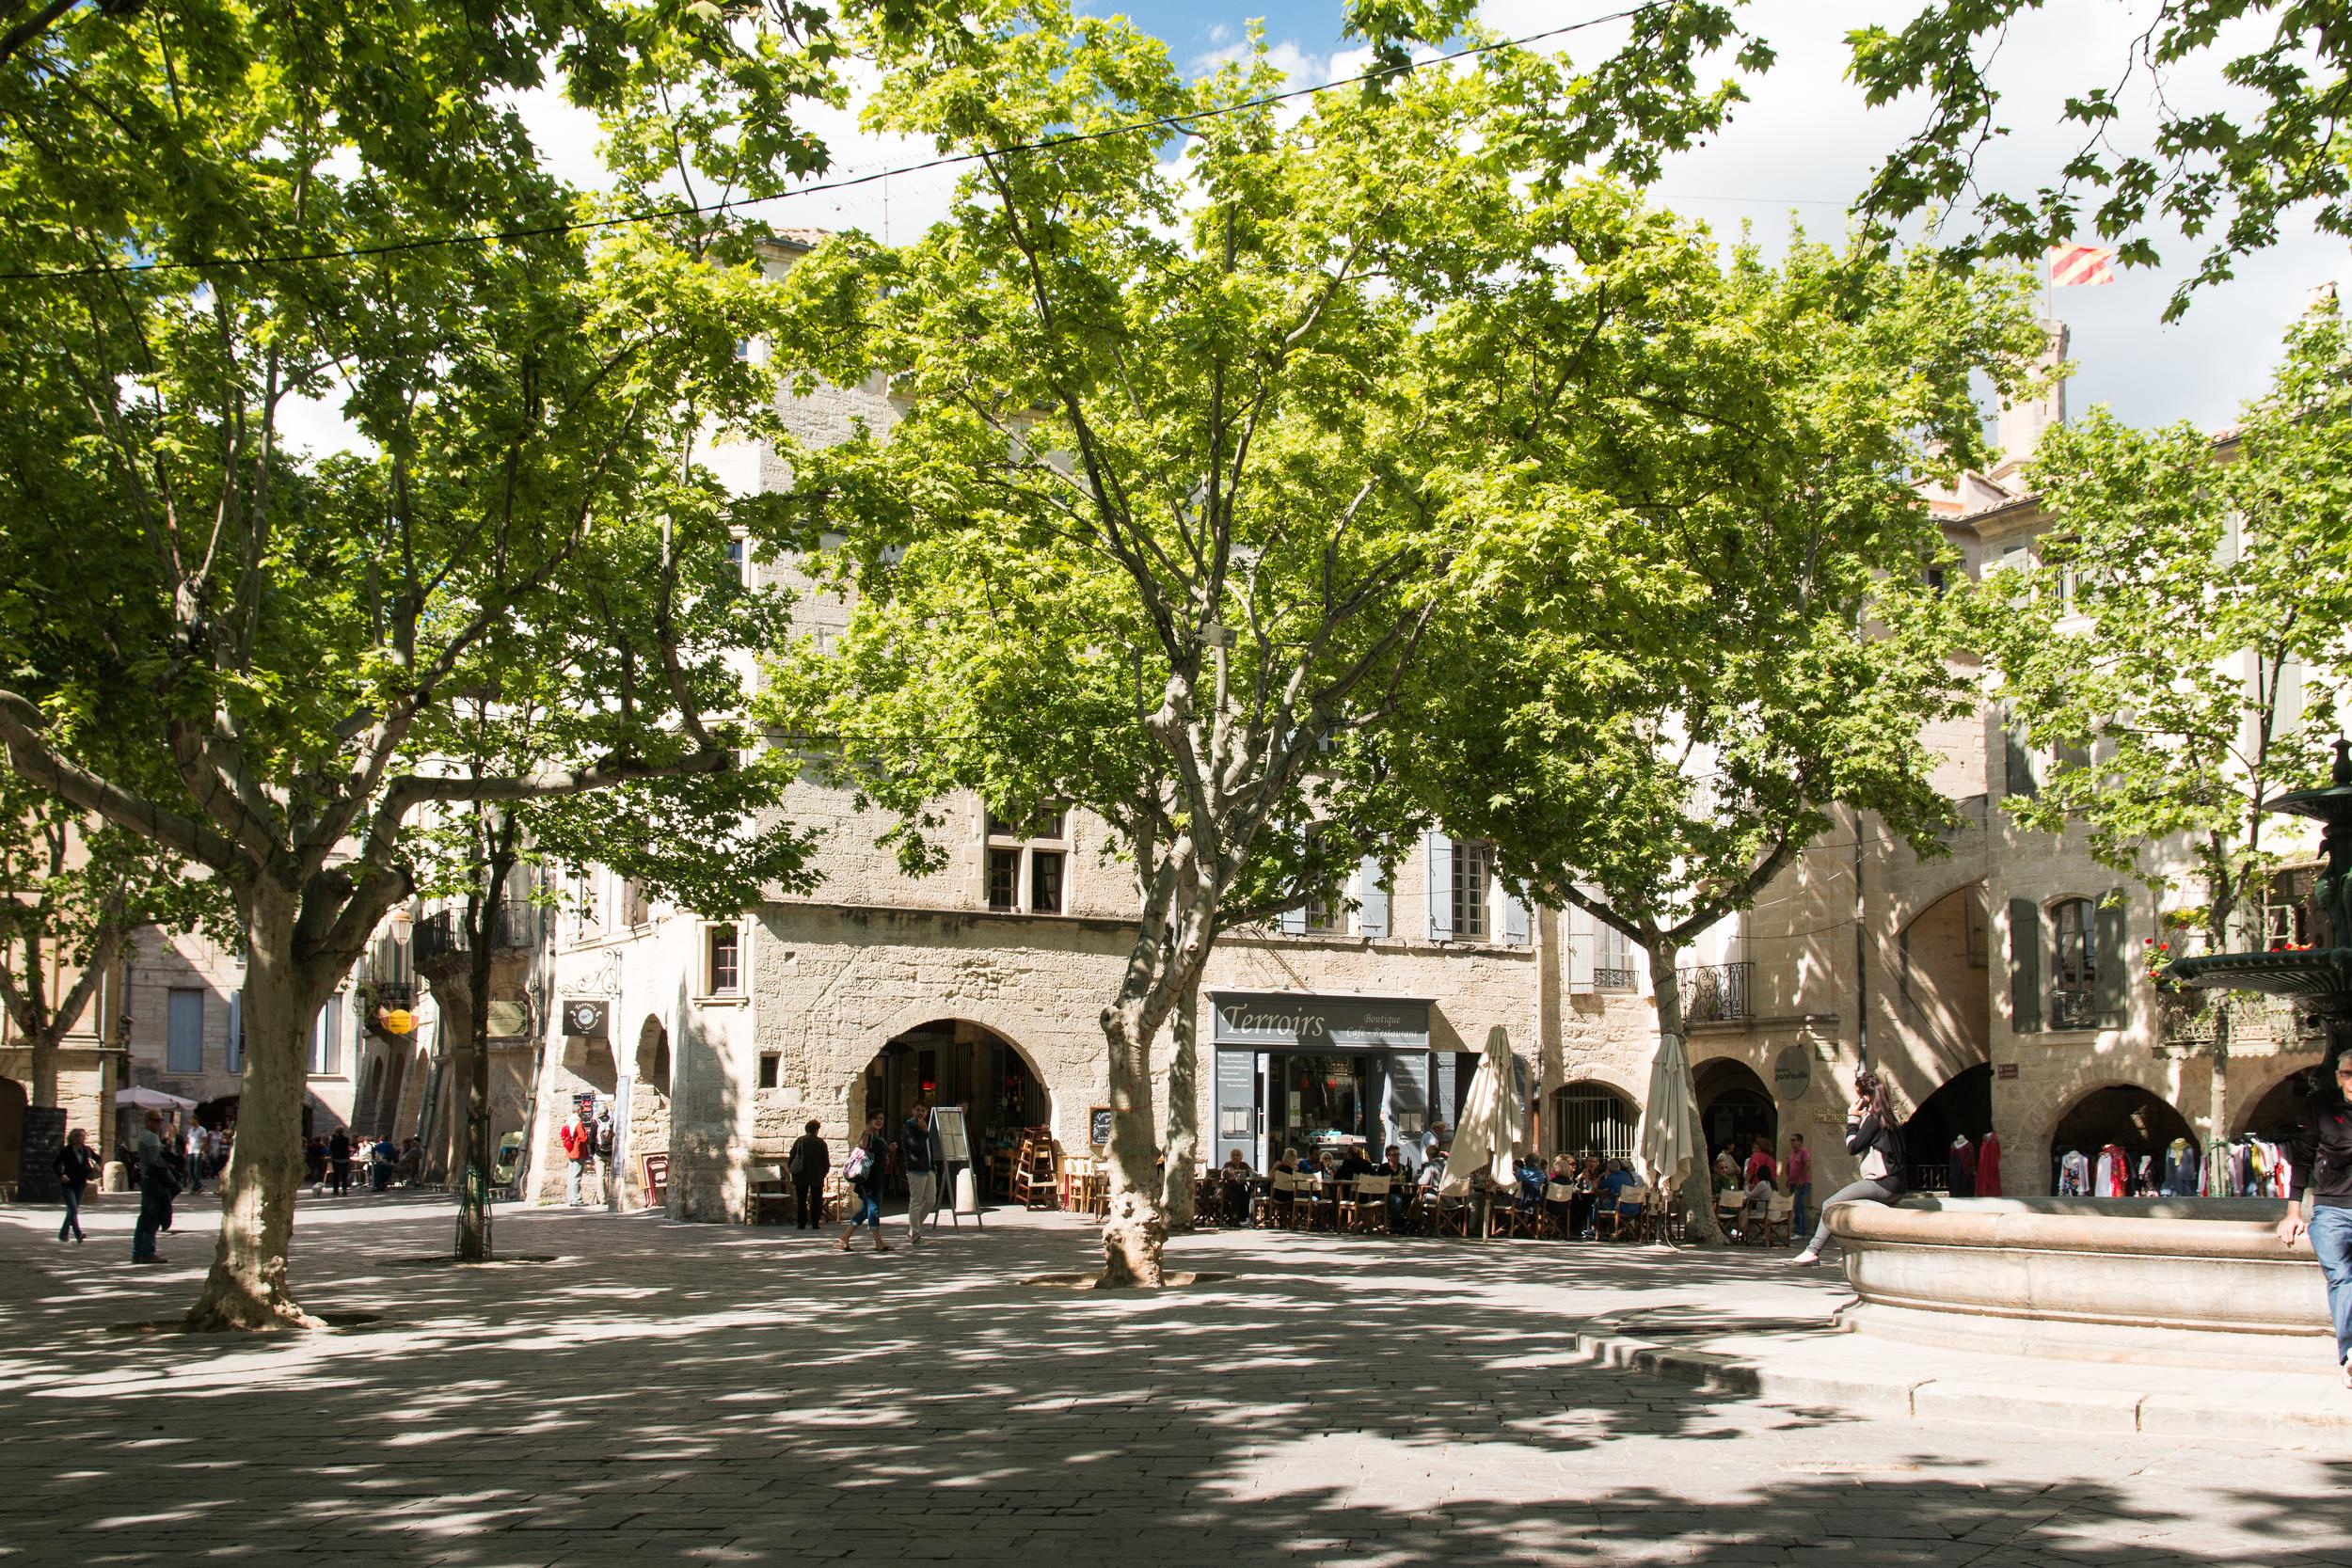 """Uzès-Place aux Herbes-20140501"" by Daniel Villafruela. Licensed under CC BY-SA 3.0 via Wikimedia Commons"